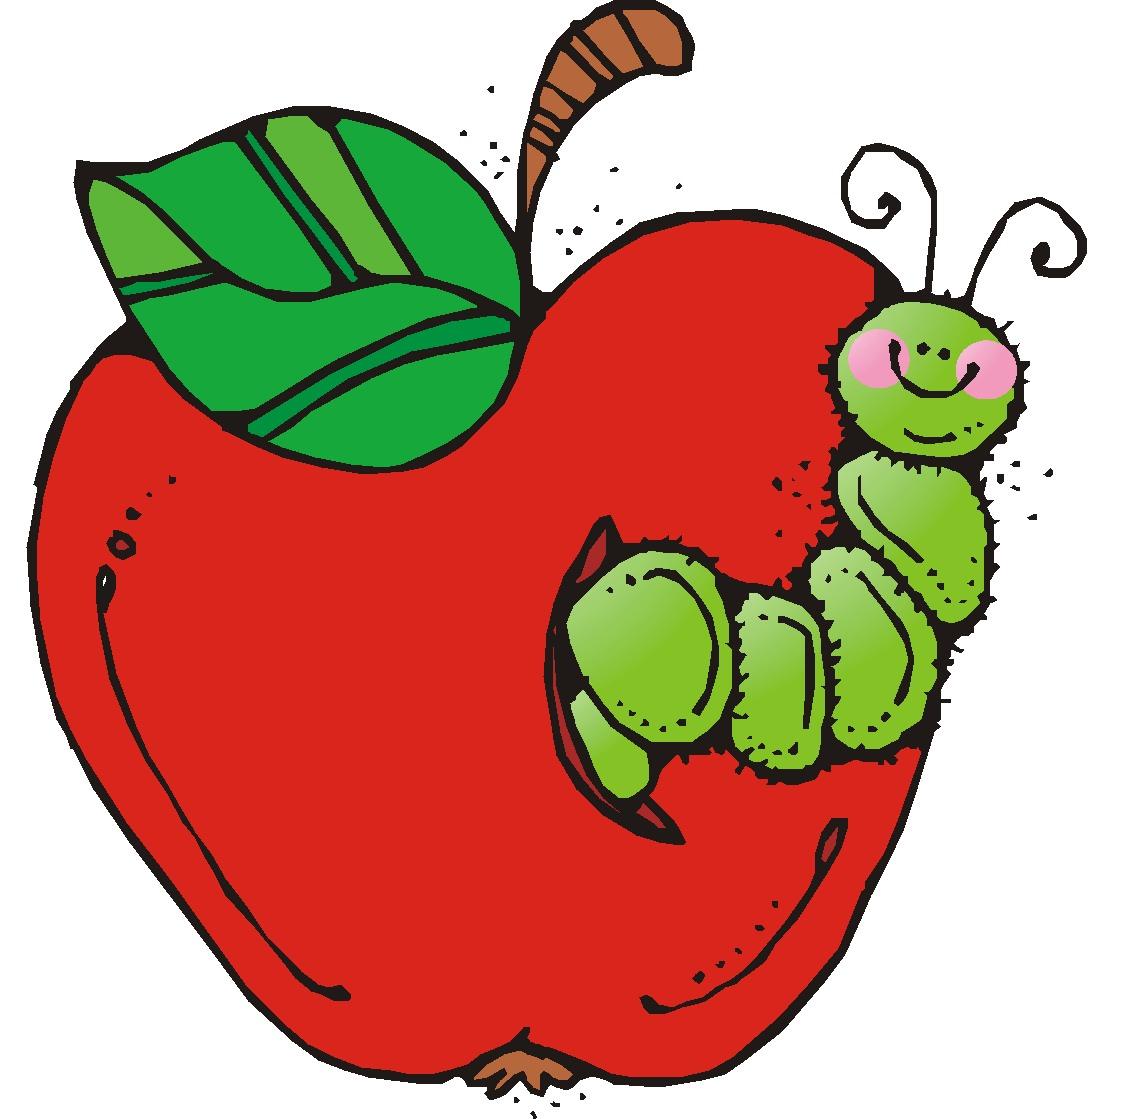 1 apple clipart library 1 teacher apple clipart - ClipartFest library